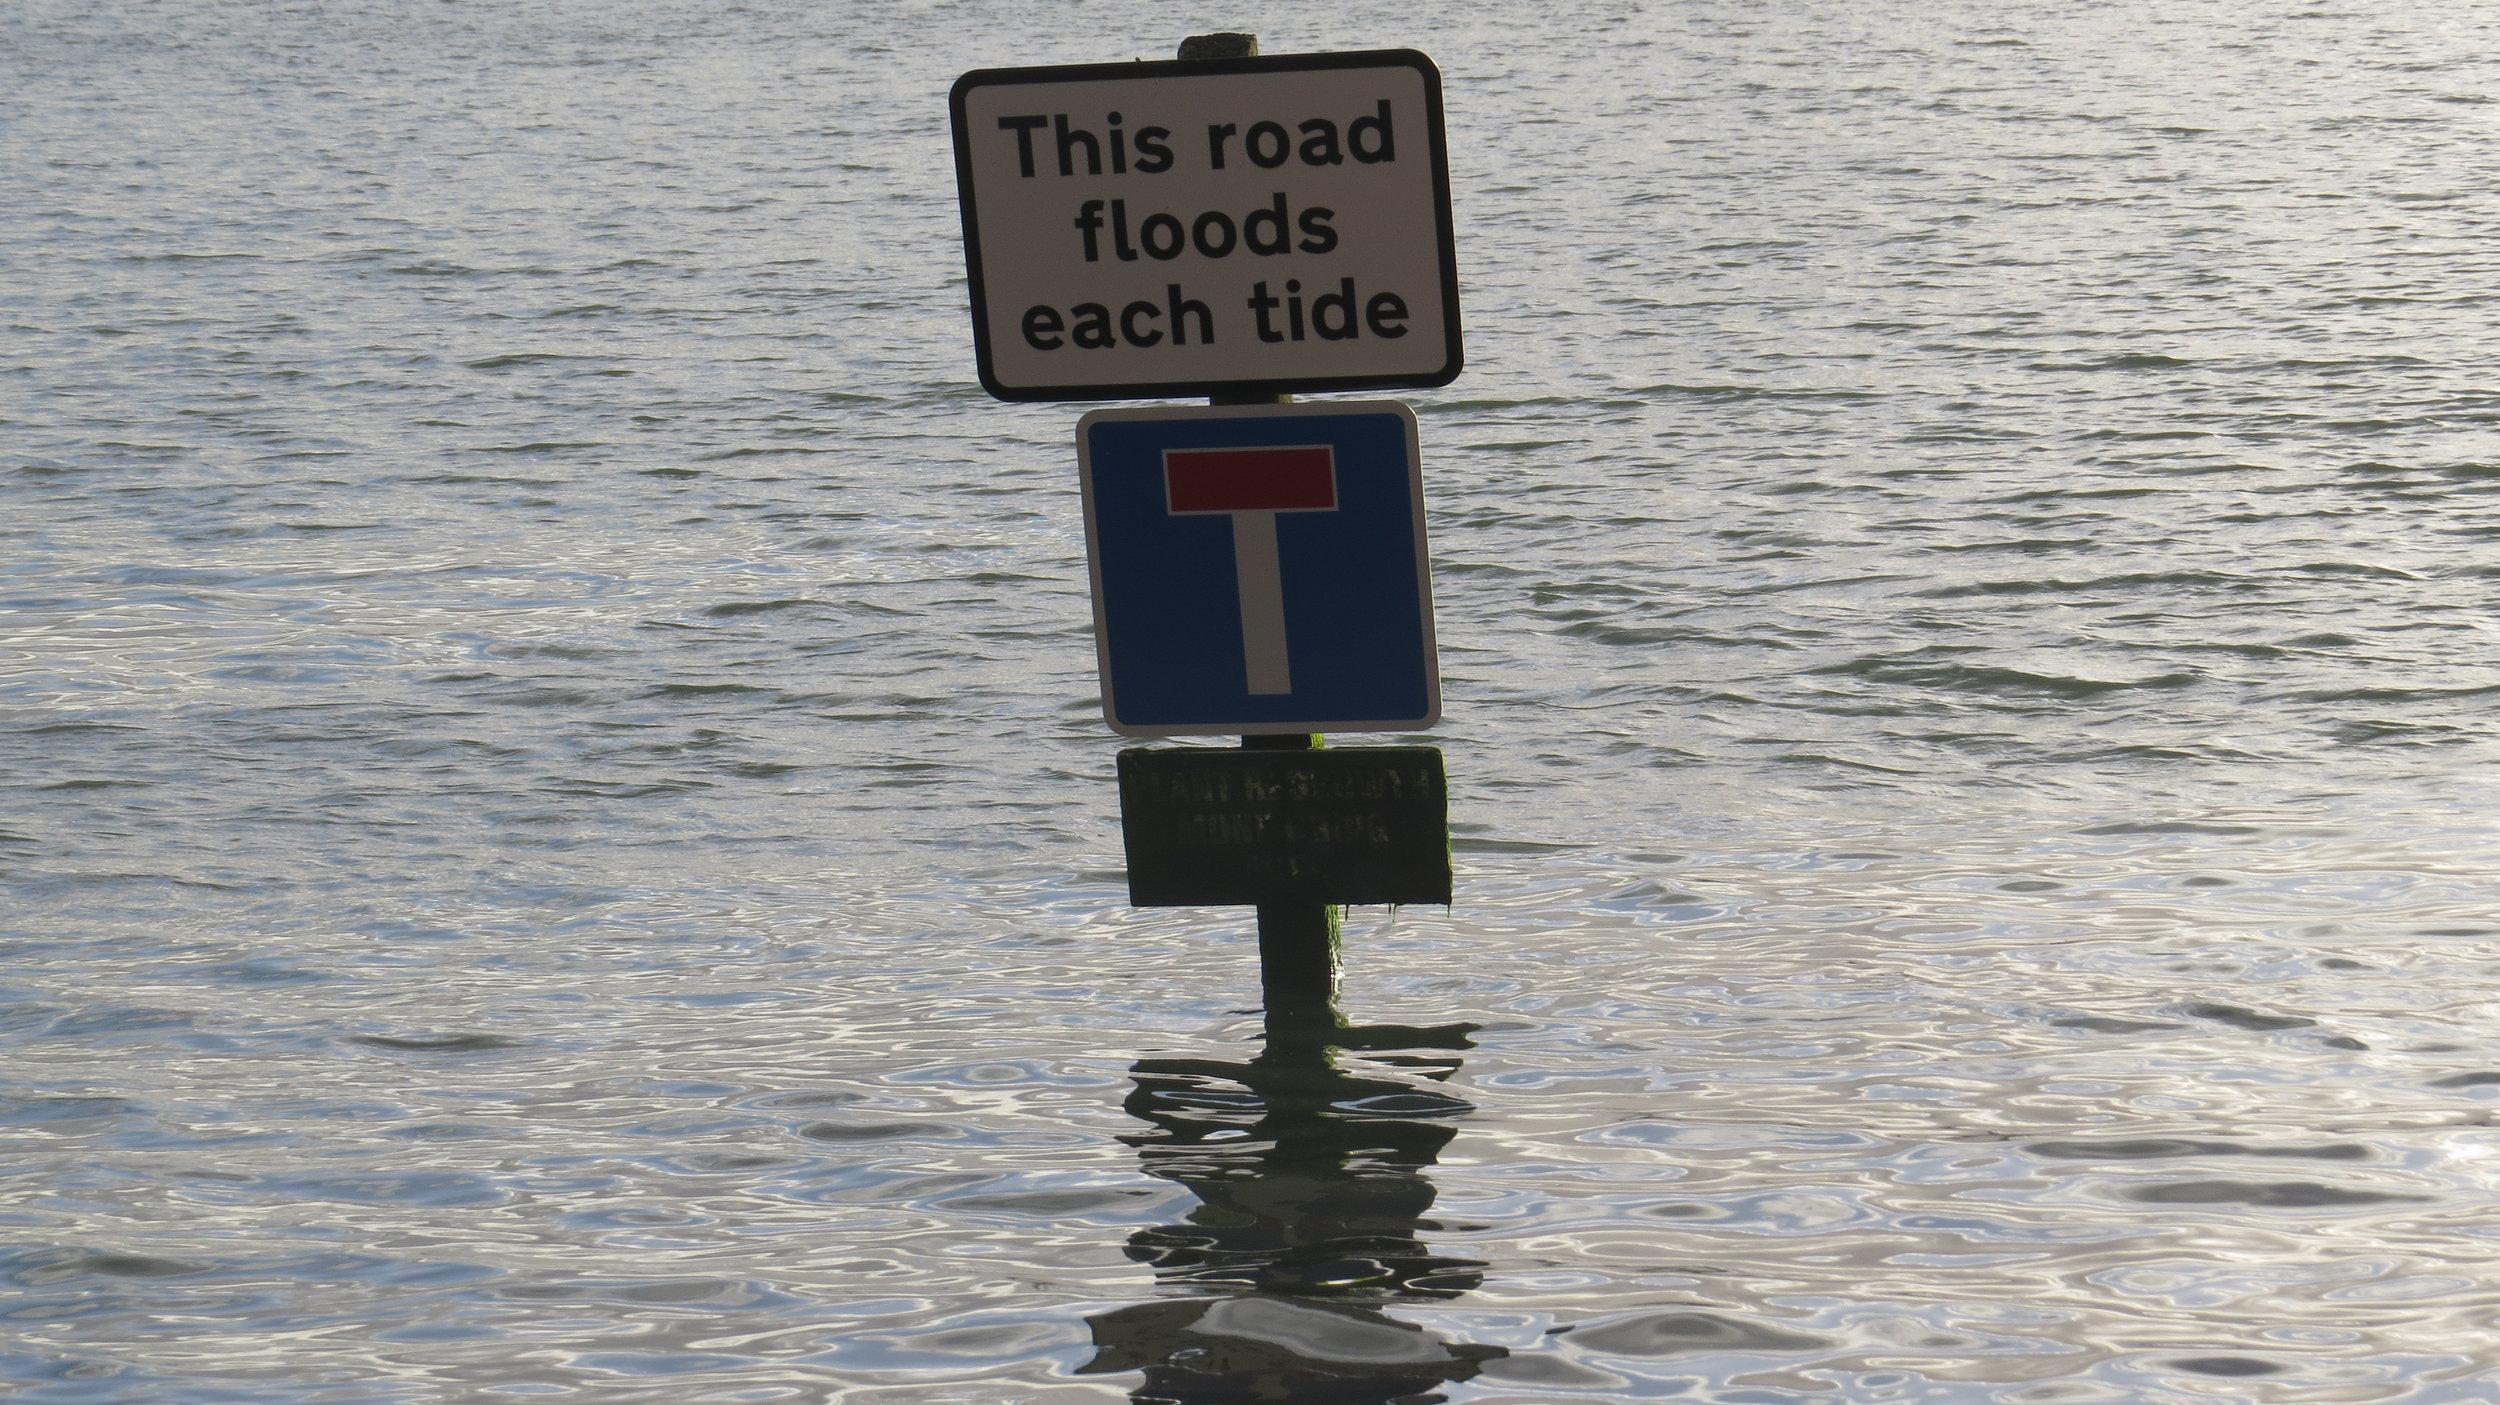 Very apt sign